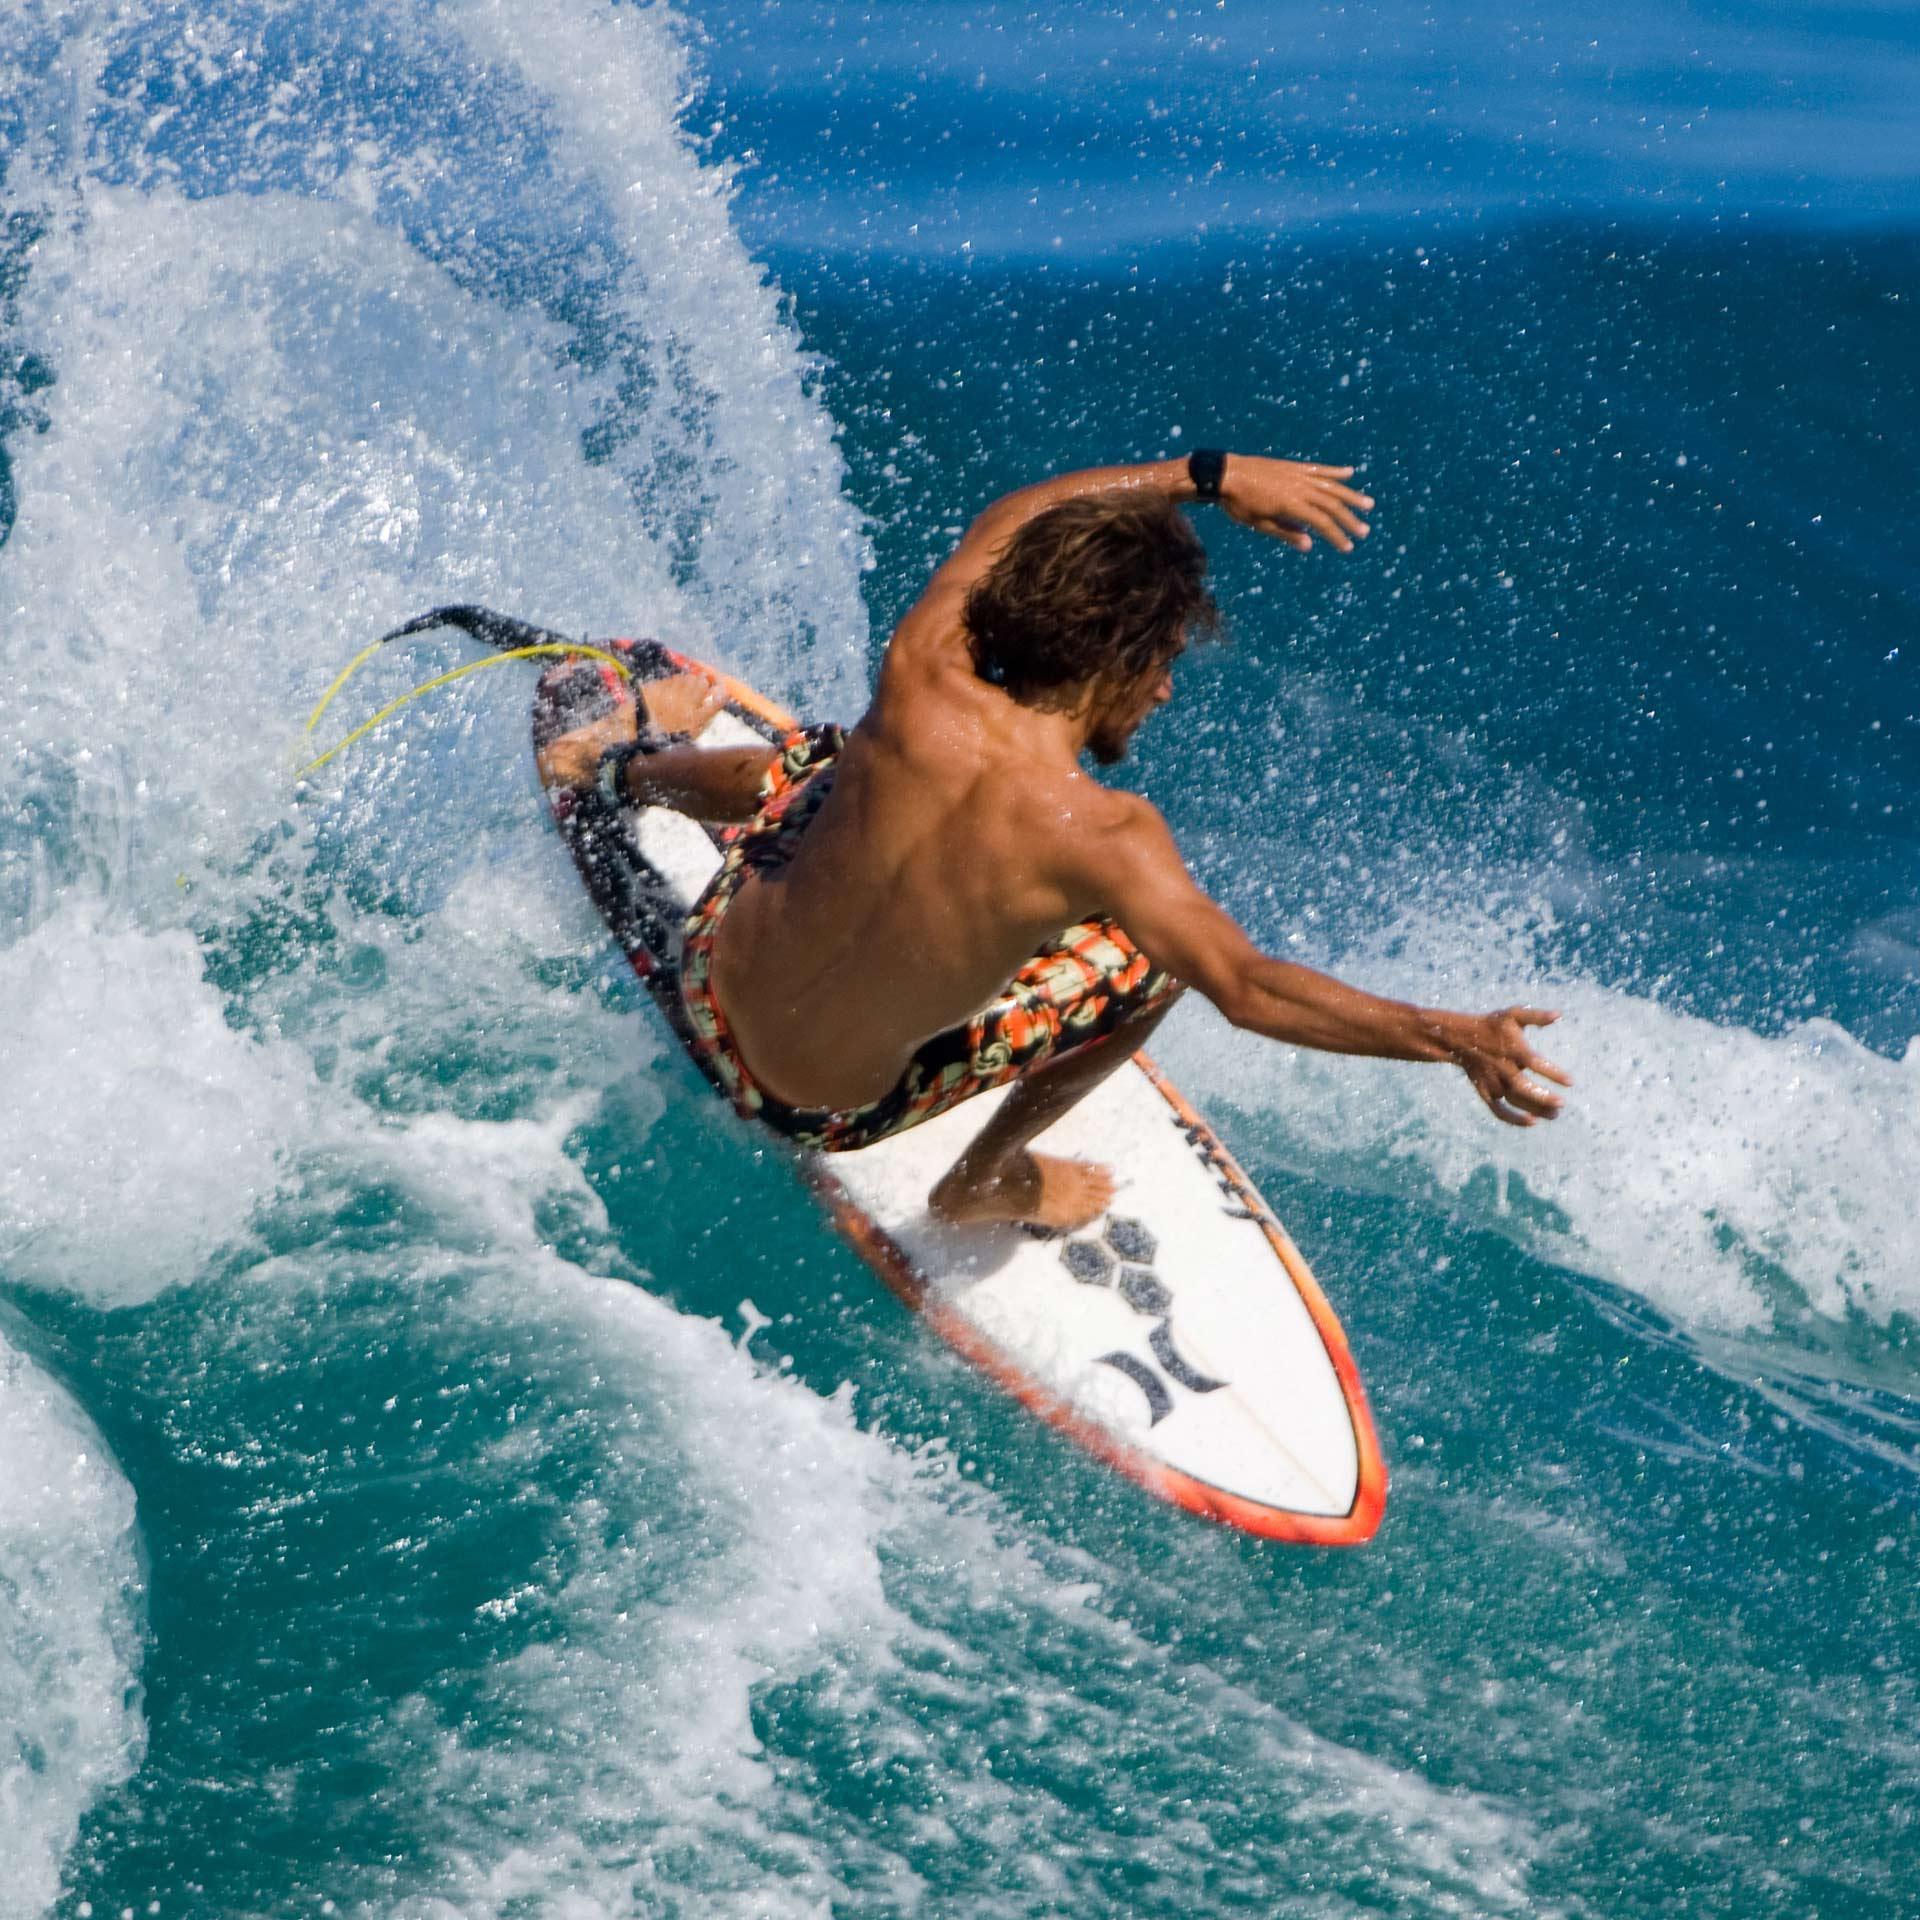 Westin Moana surfrider   Vacanza relax alle Hawaii ...